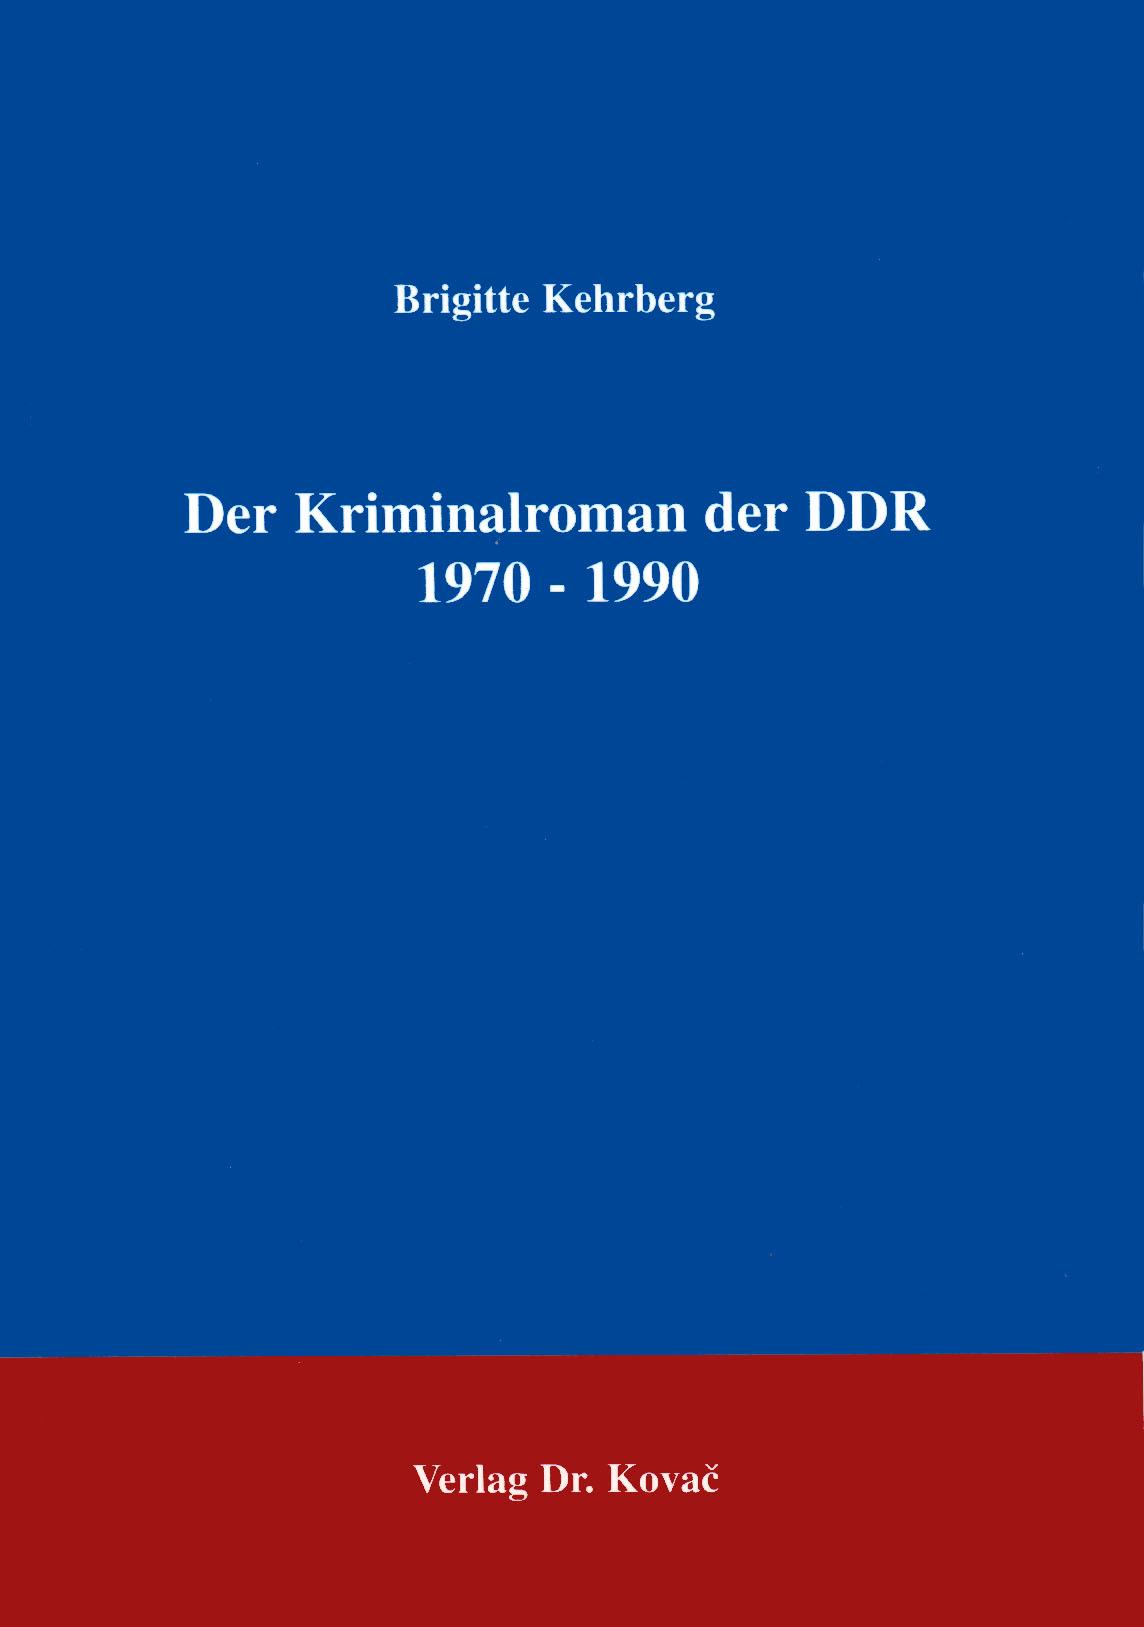 Cover: Der Kriminalroman der DDR 1970 - 1990